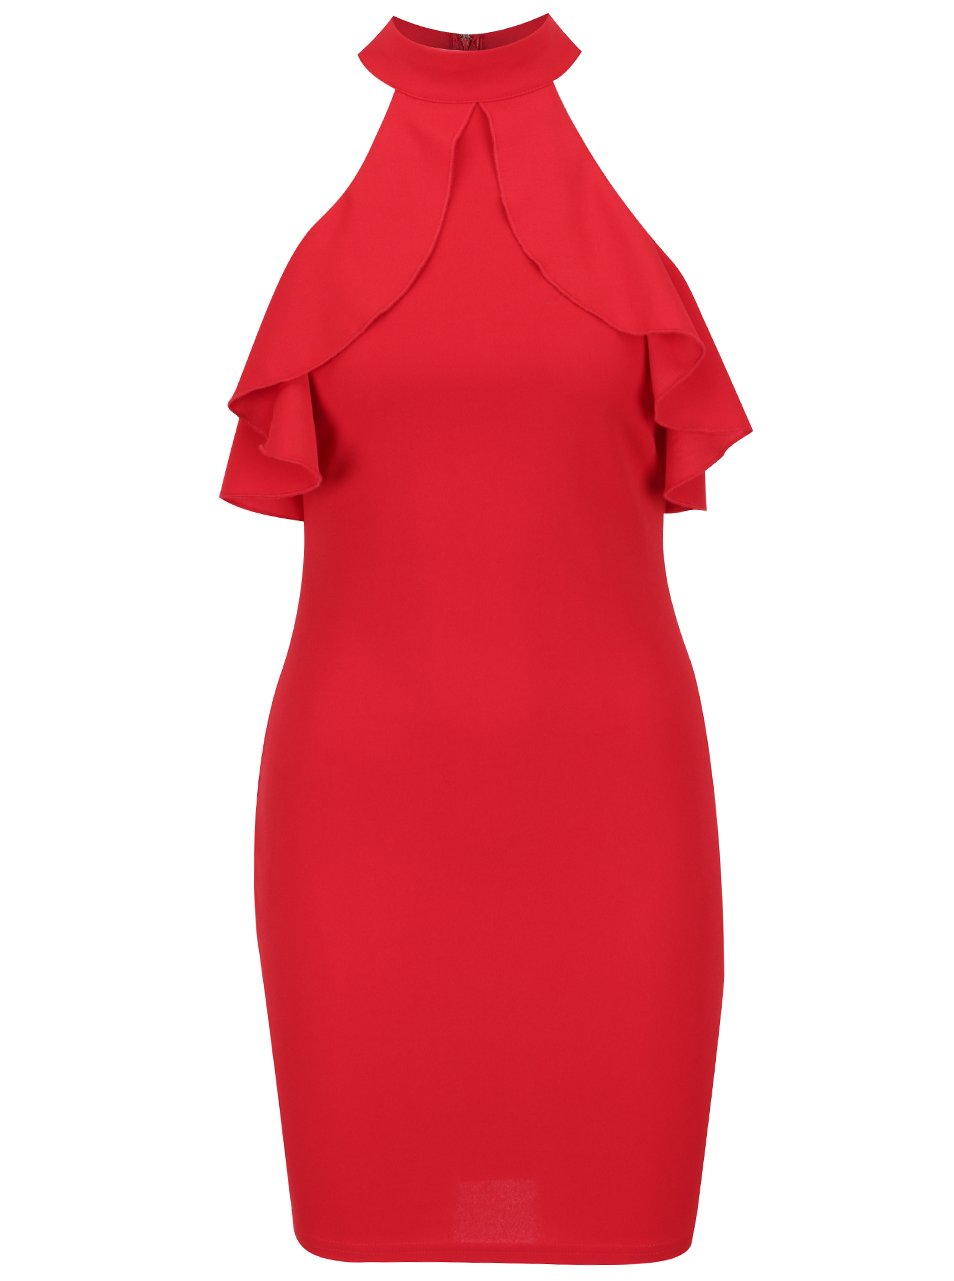 Červené šaty s odhalenými ramenami AX Paris  0709d562acf